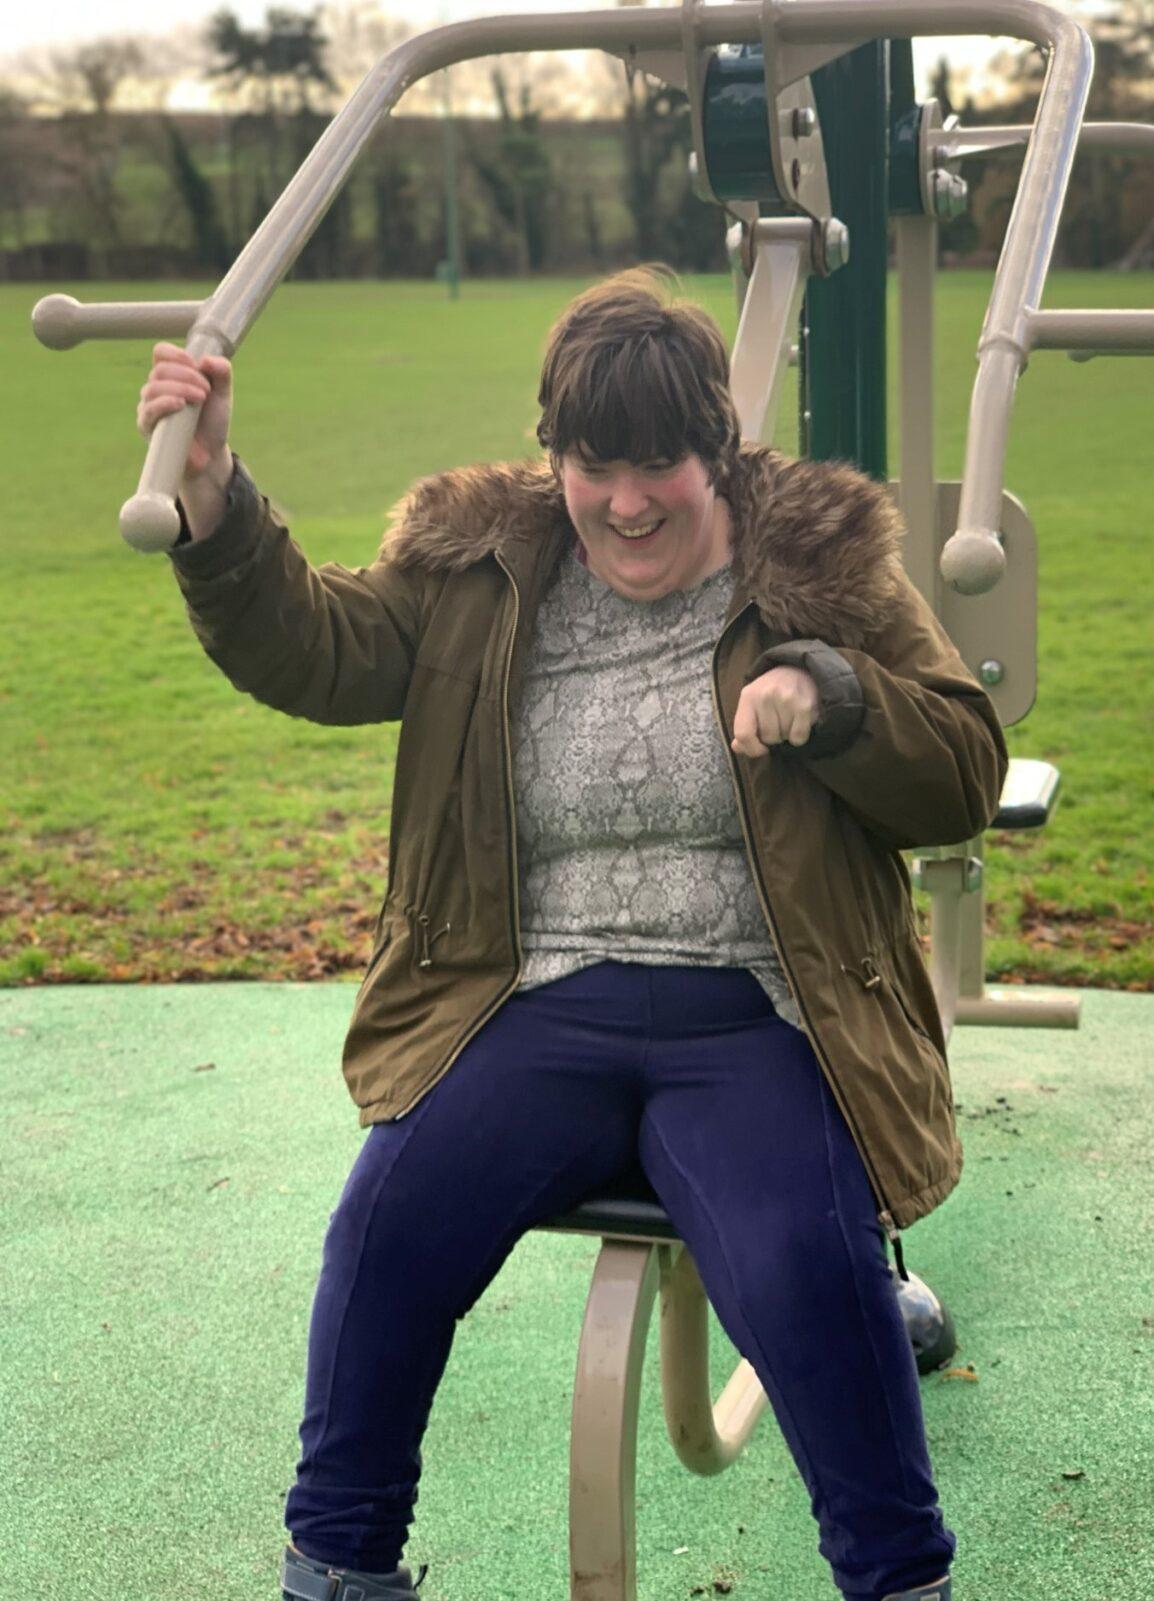 Chelsea enjoying the park in Southwell